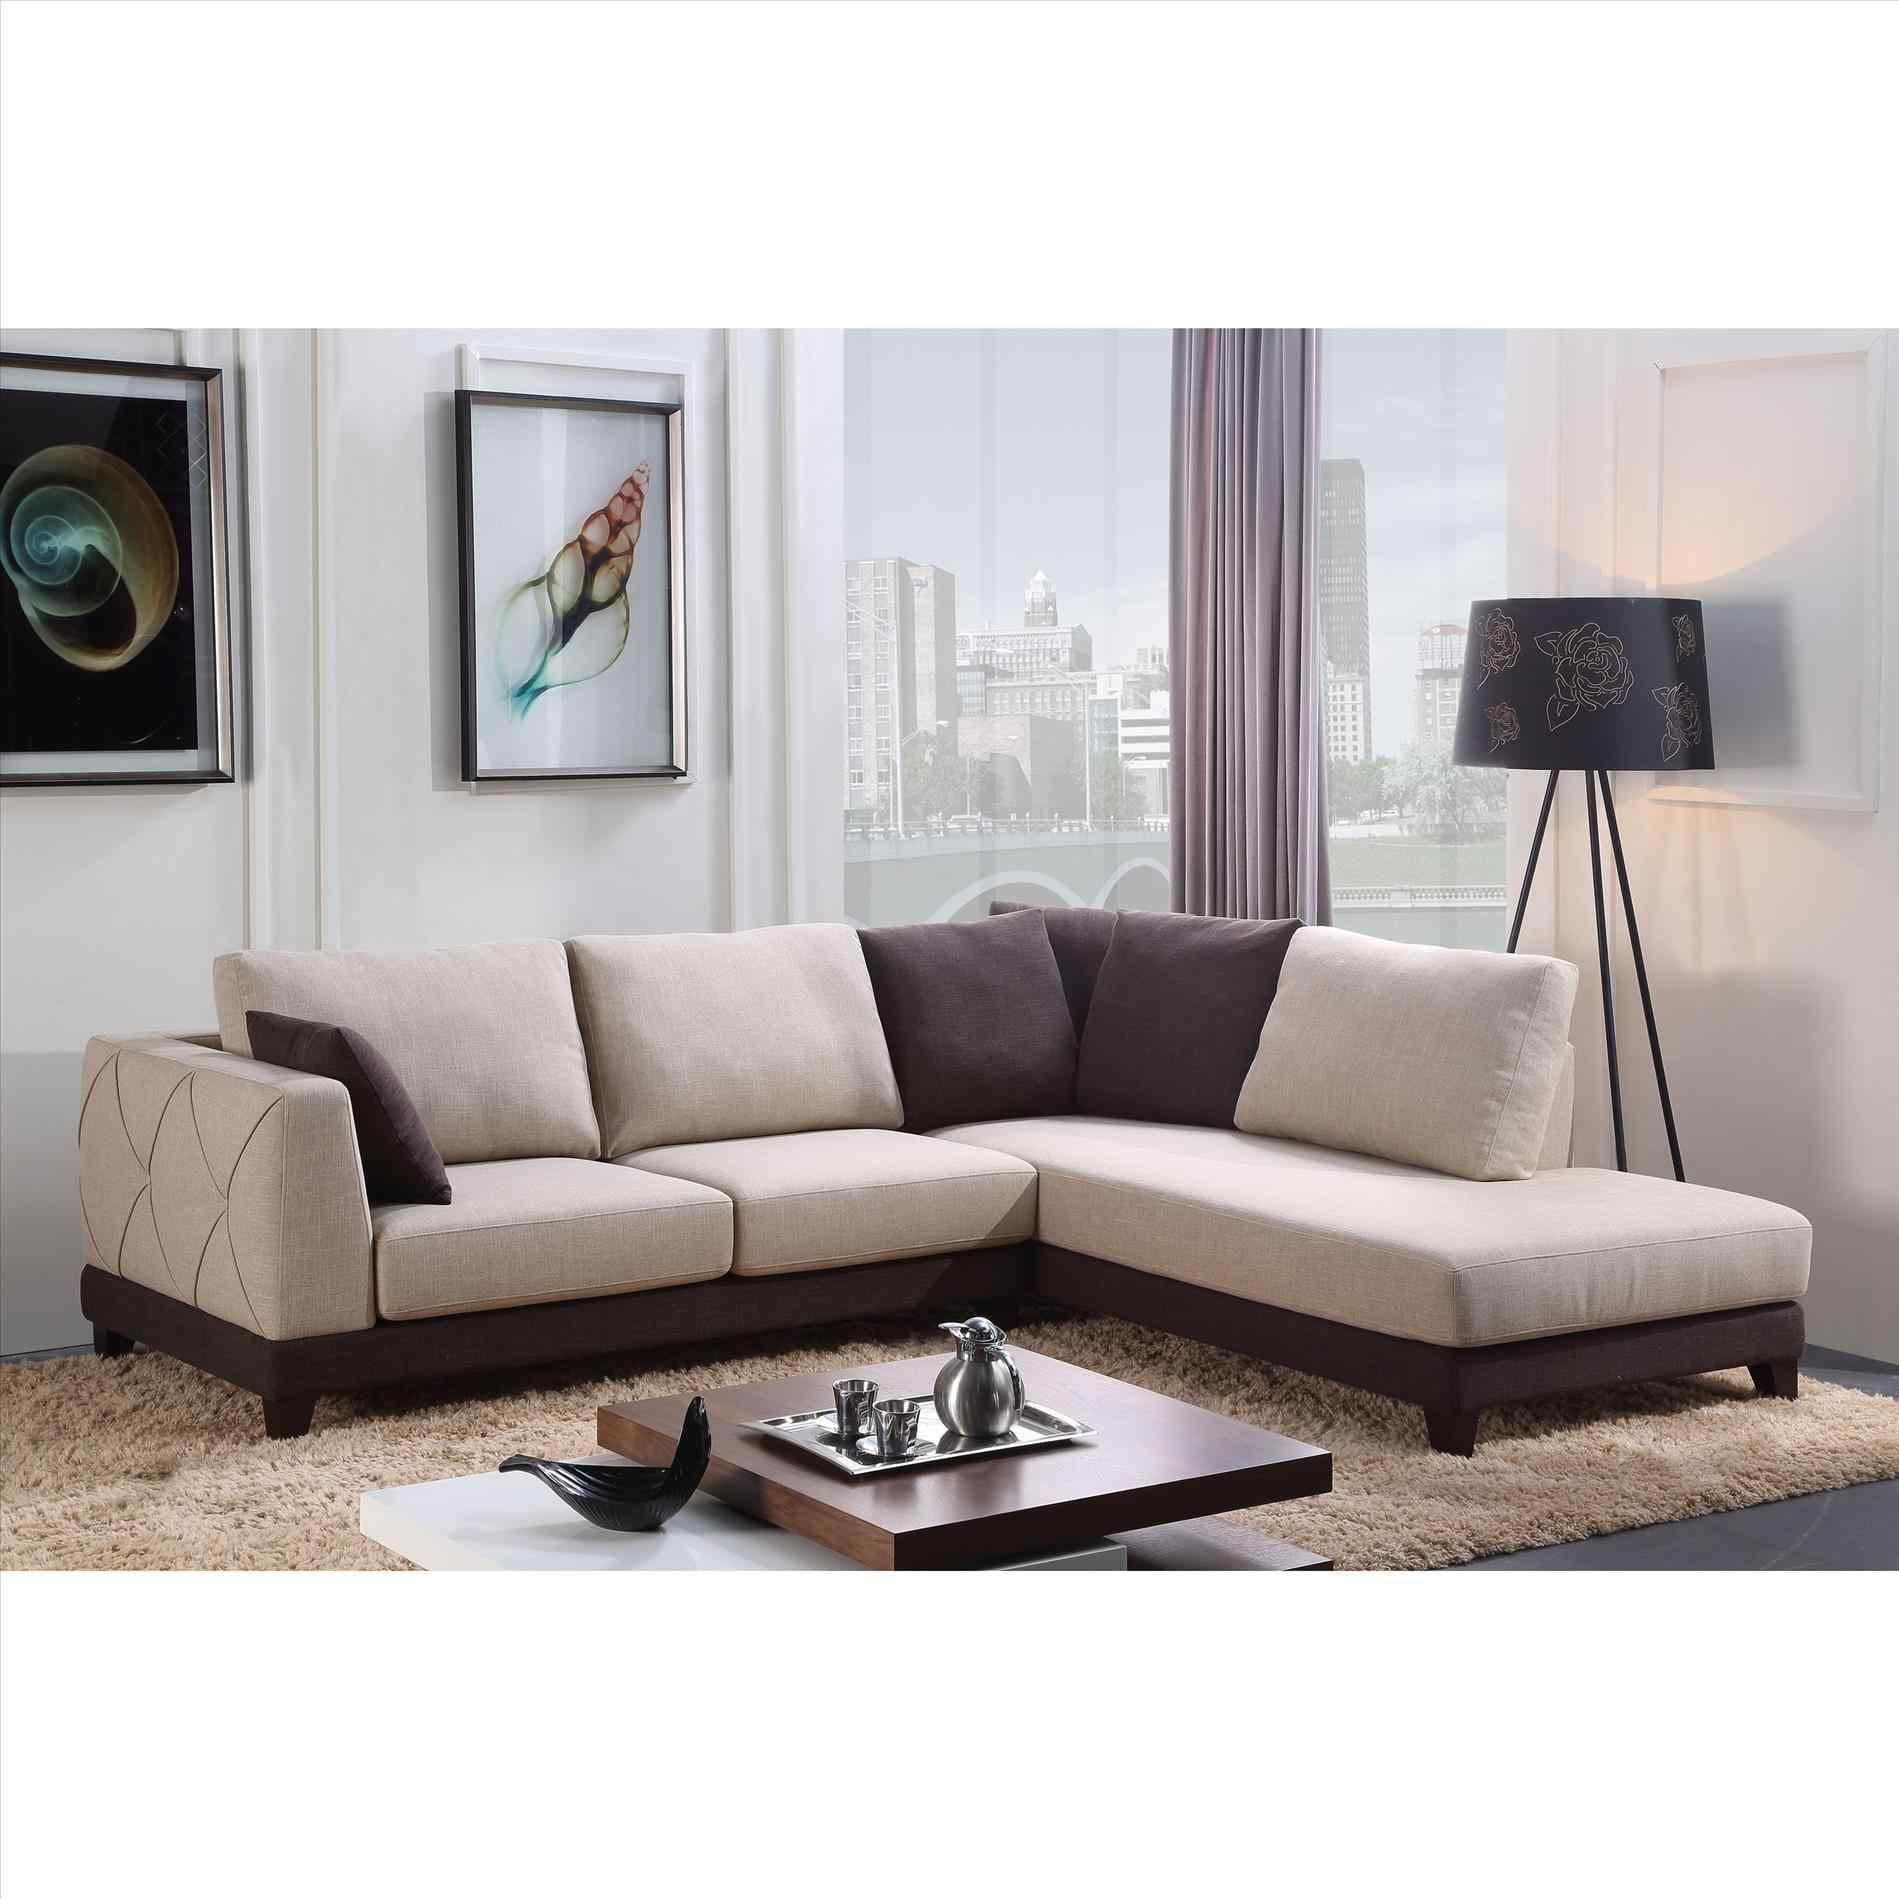 for small decor ideas teenage girls futon cheap sectional sofas